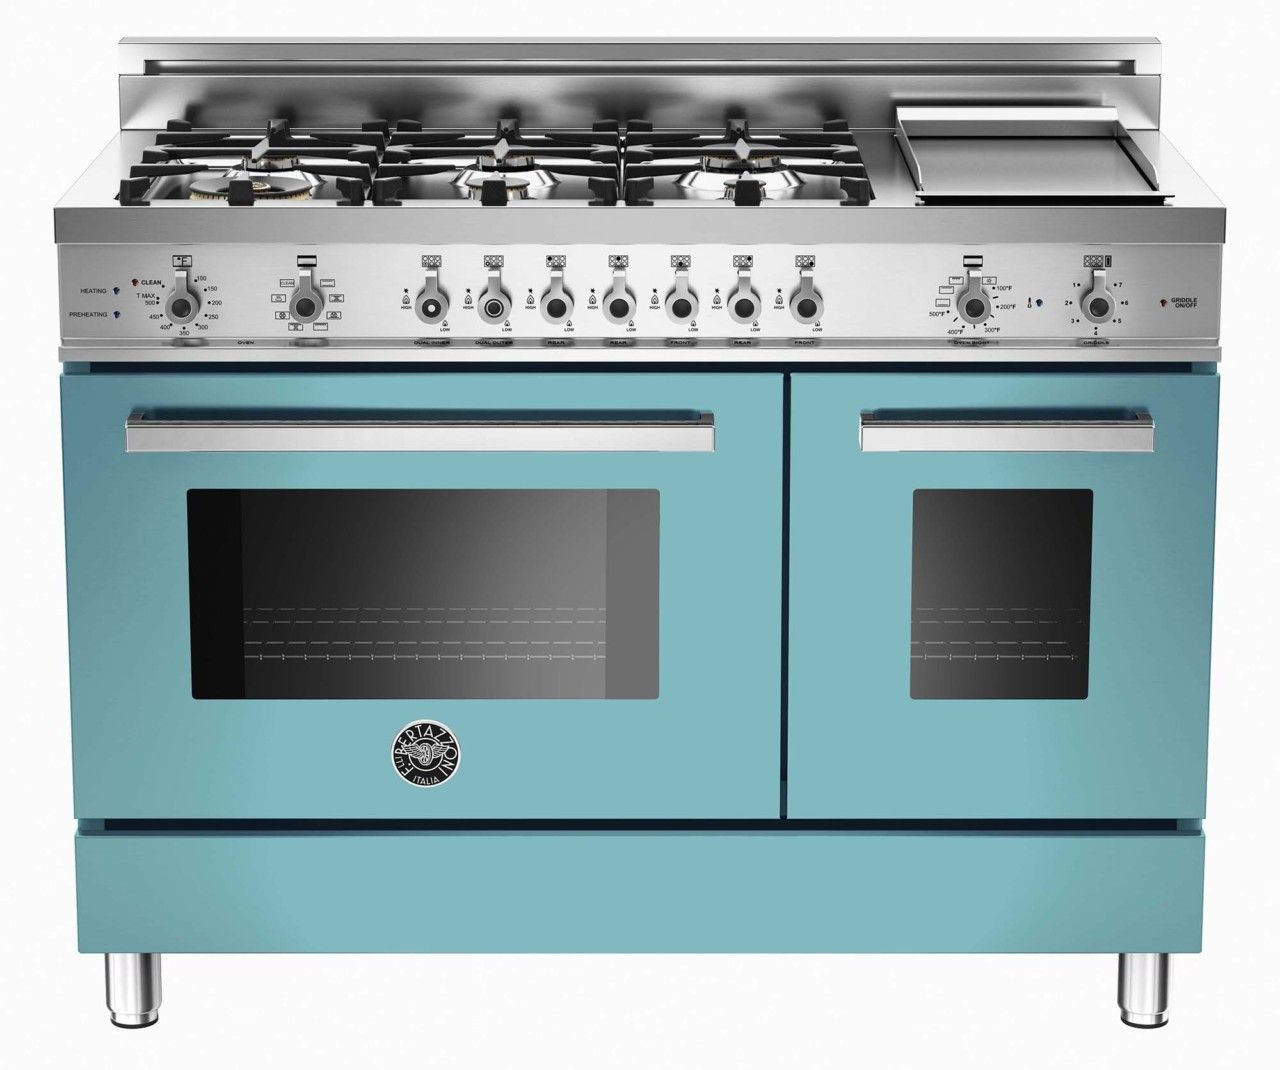 Bertazzoni Oven Ranges Are Painted Like Italian Sports Cars Pleasing Range Kitchen Design Decoration